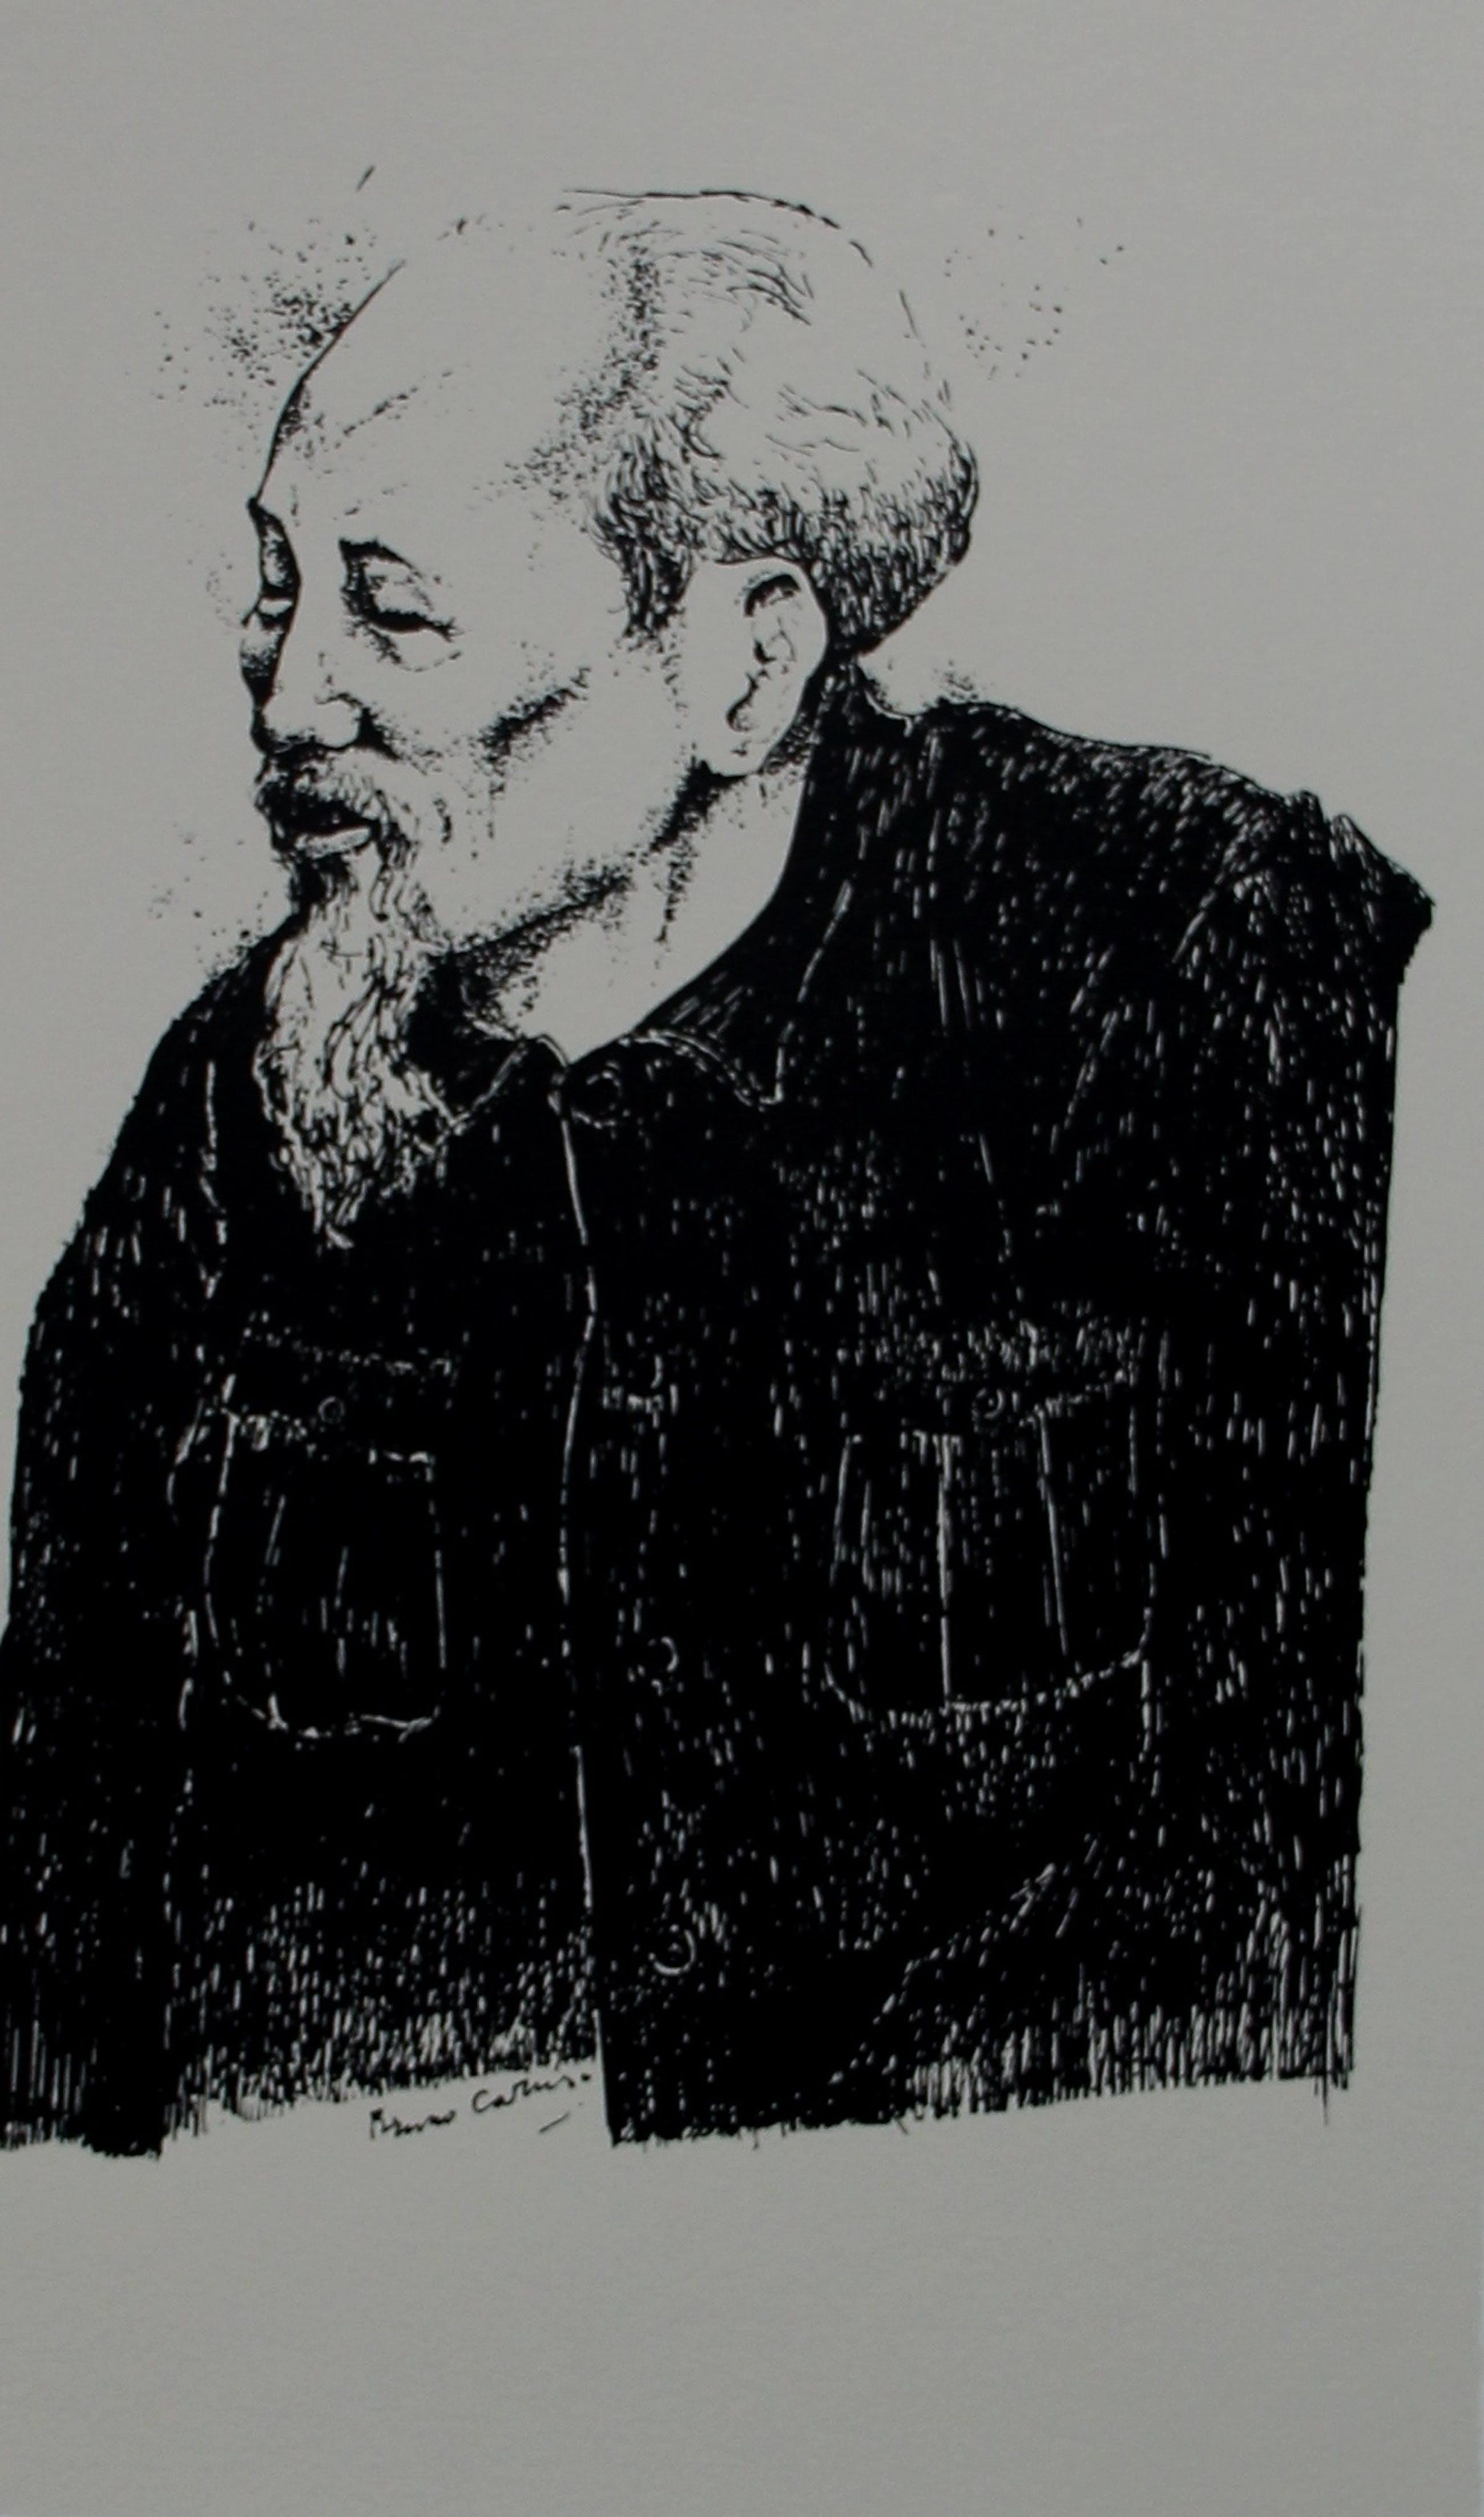 Bruno Caruso - Zeefdruk: Portret van Ho Tsji Min kopen? Bied vanaf 55!